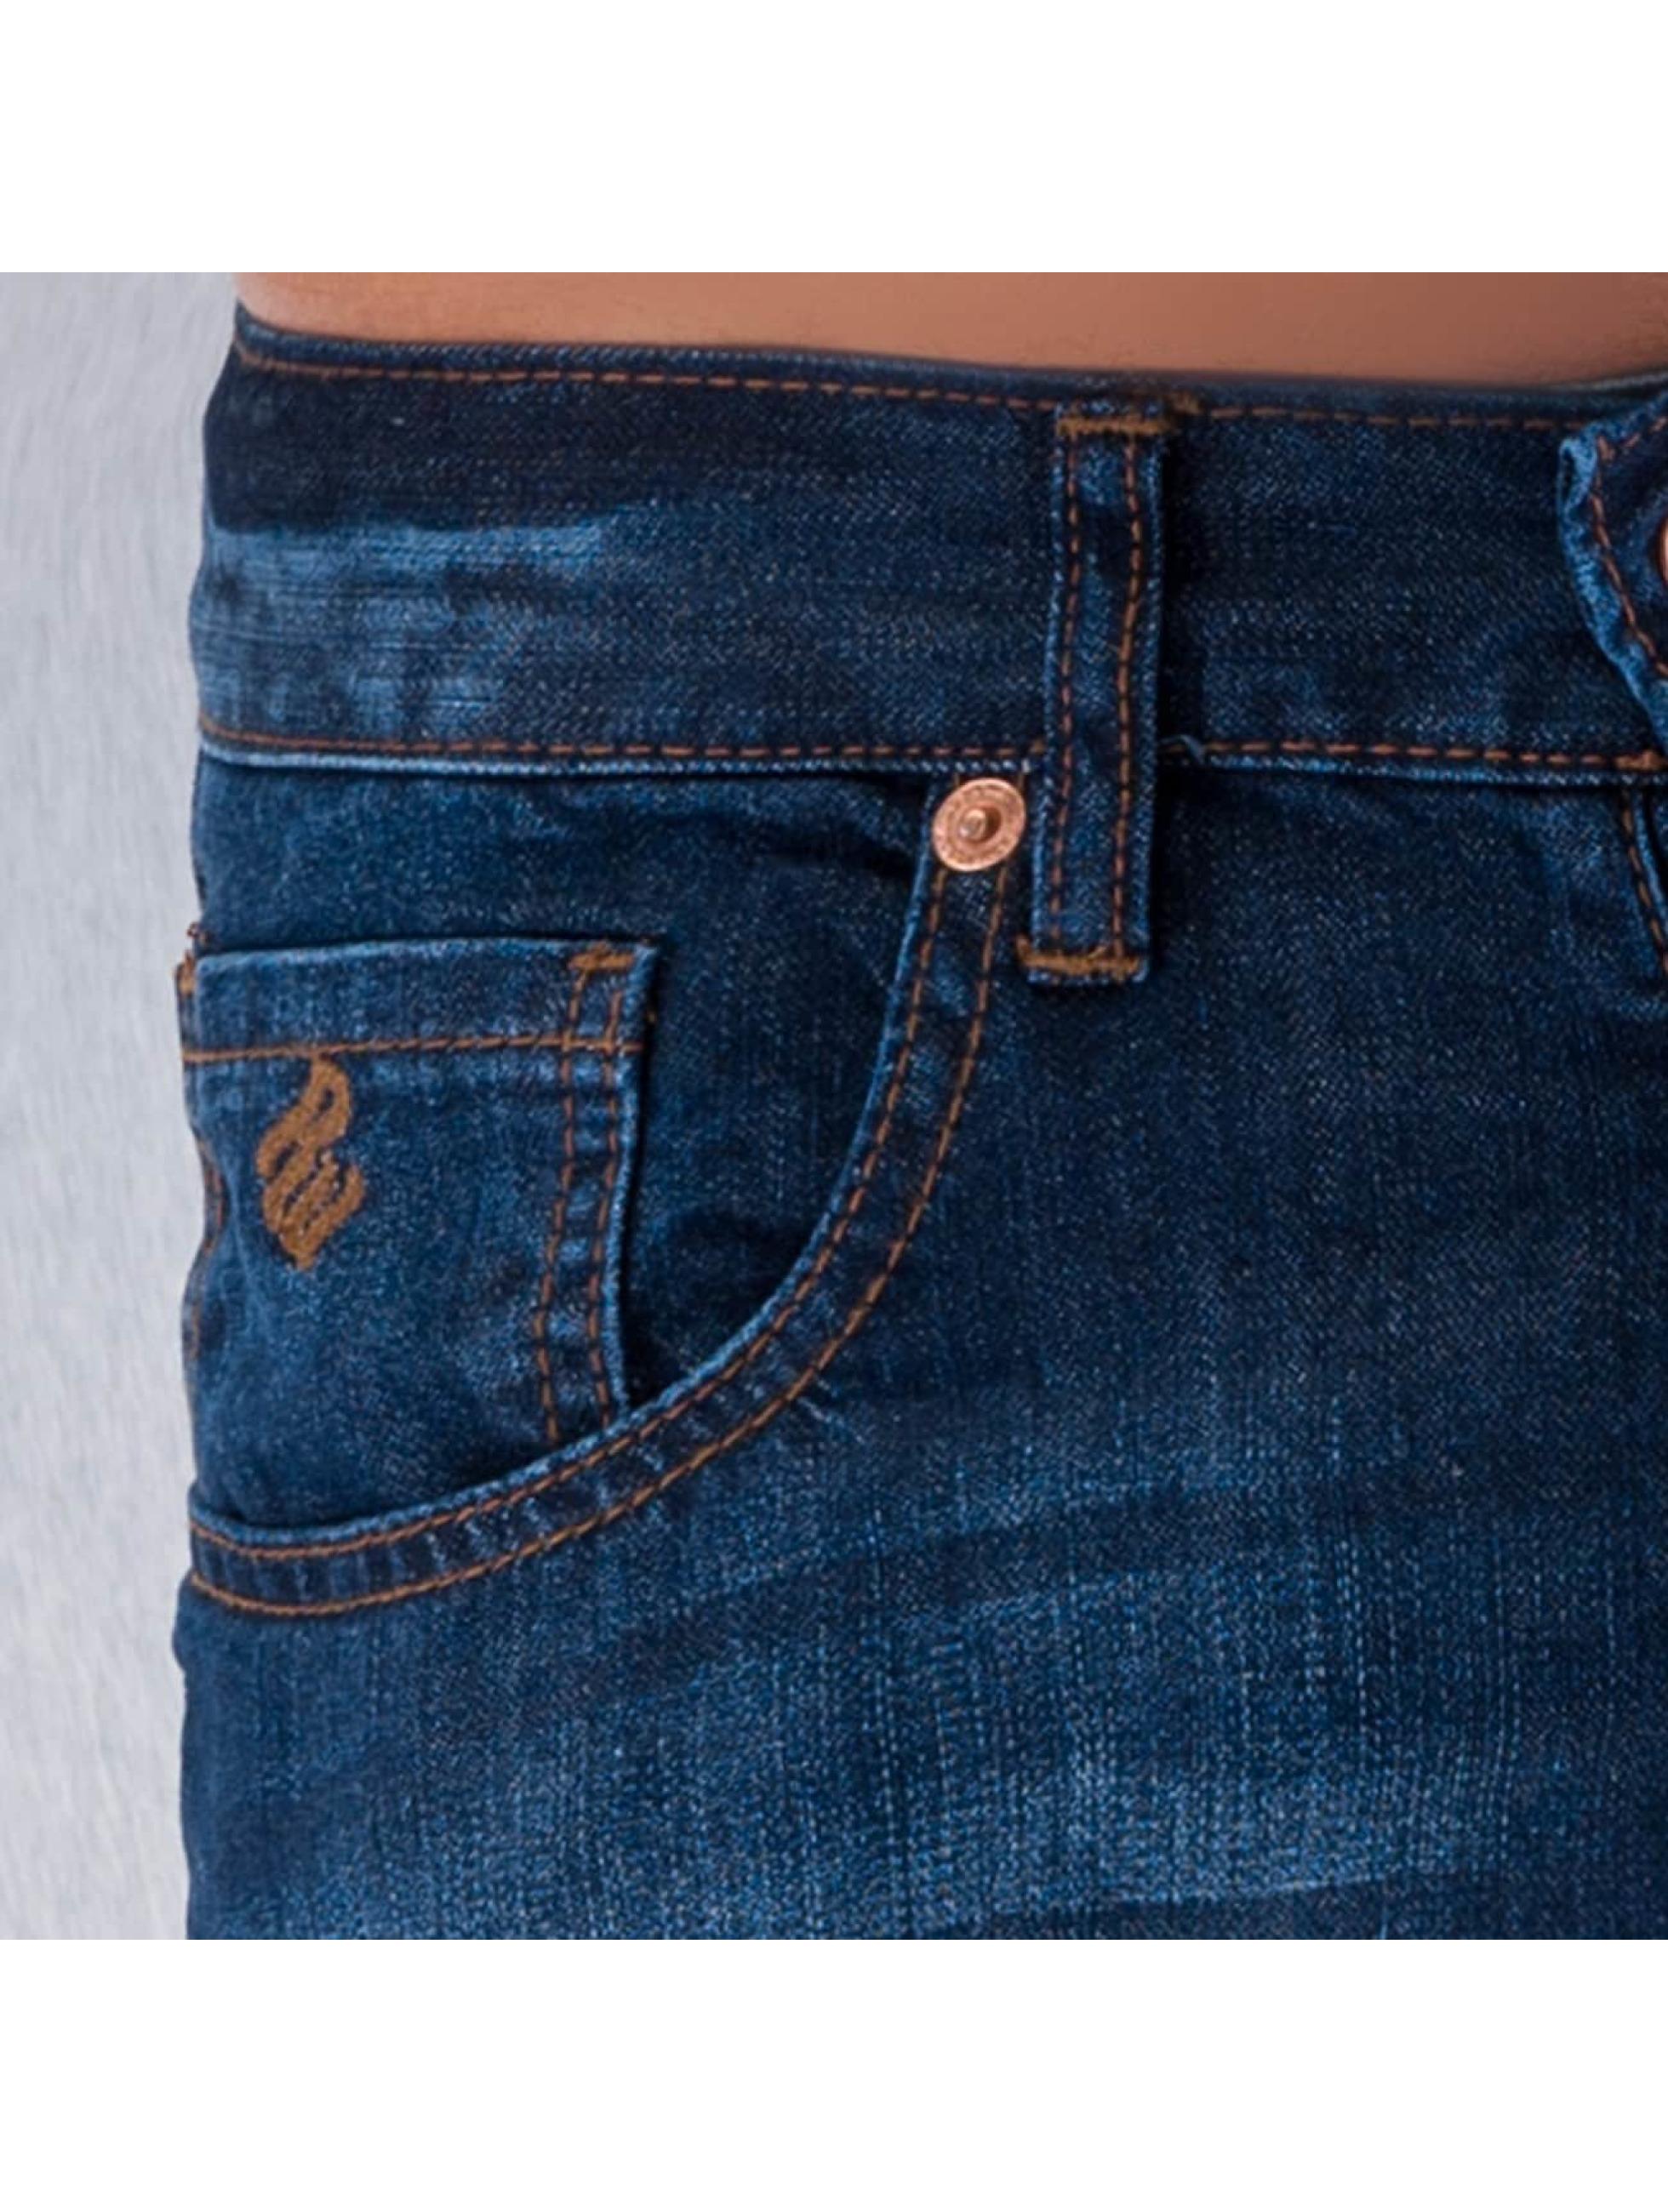 Rocawear Джинсы-трубы Tap синий